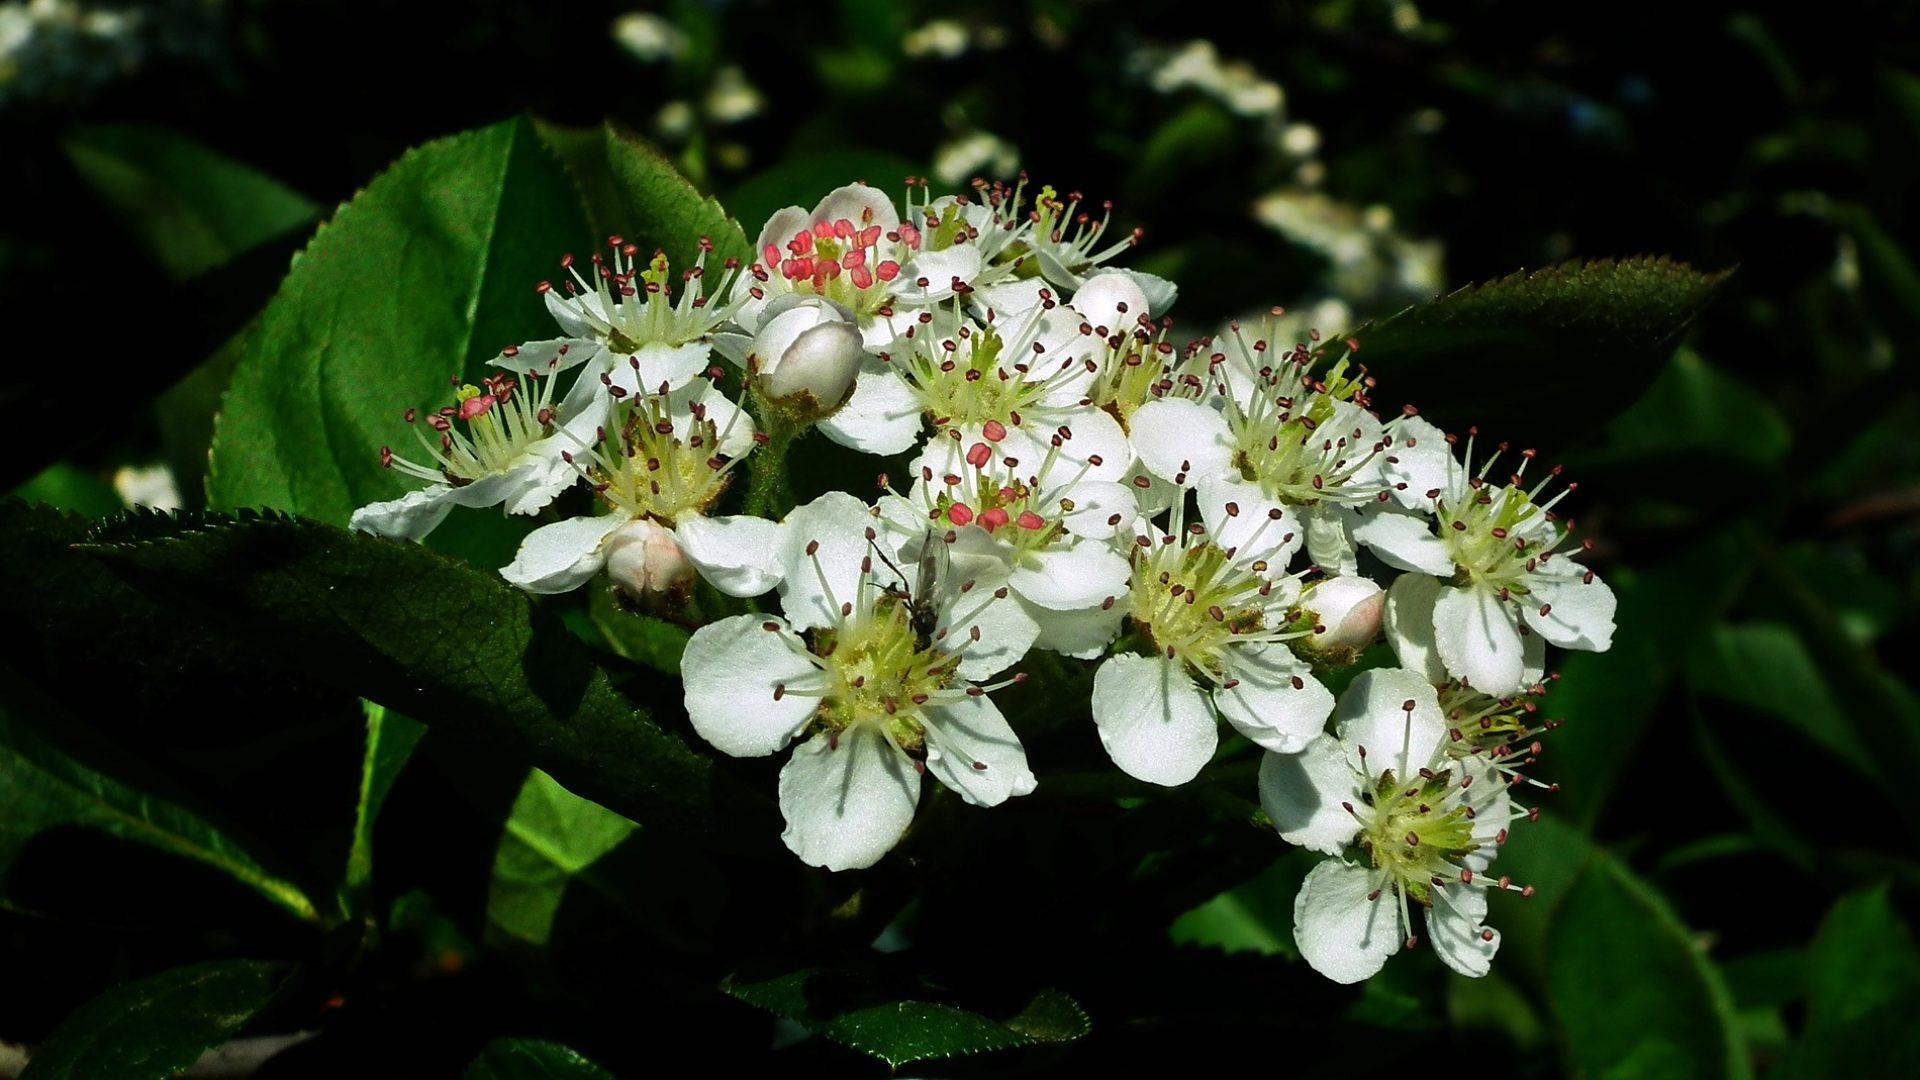 aronia-nature-3358645_1920